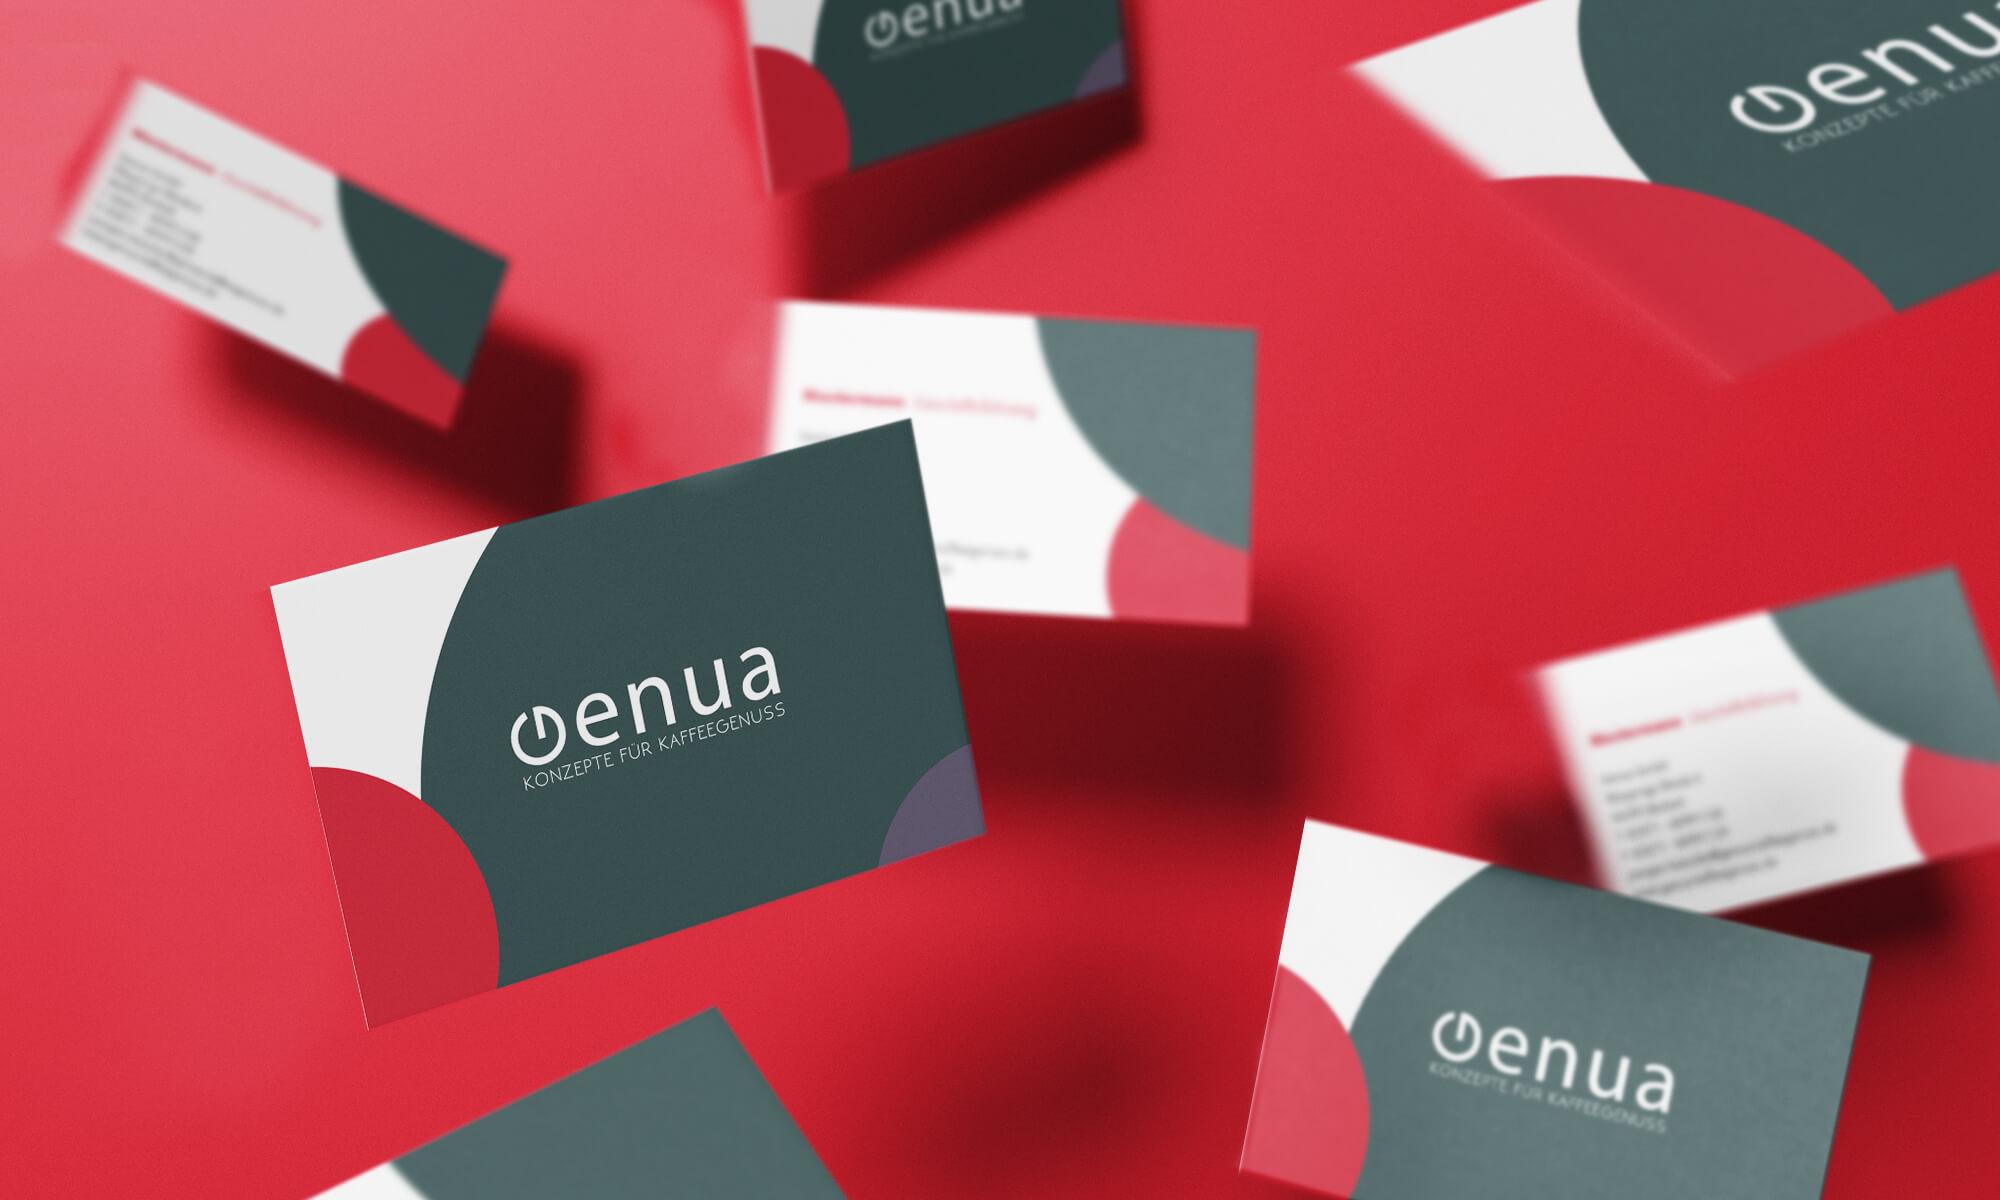 Schau und Horch Visitenkarte Genua - Corporate Identity für Genua